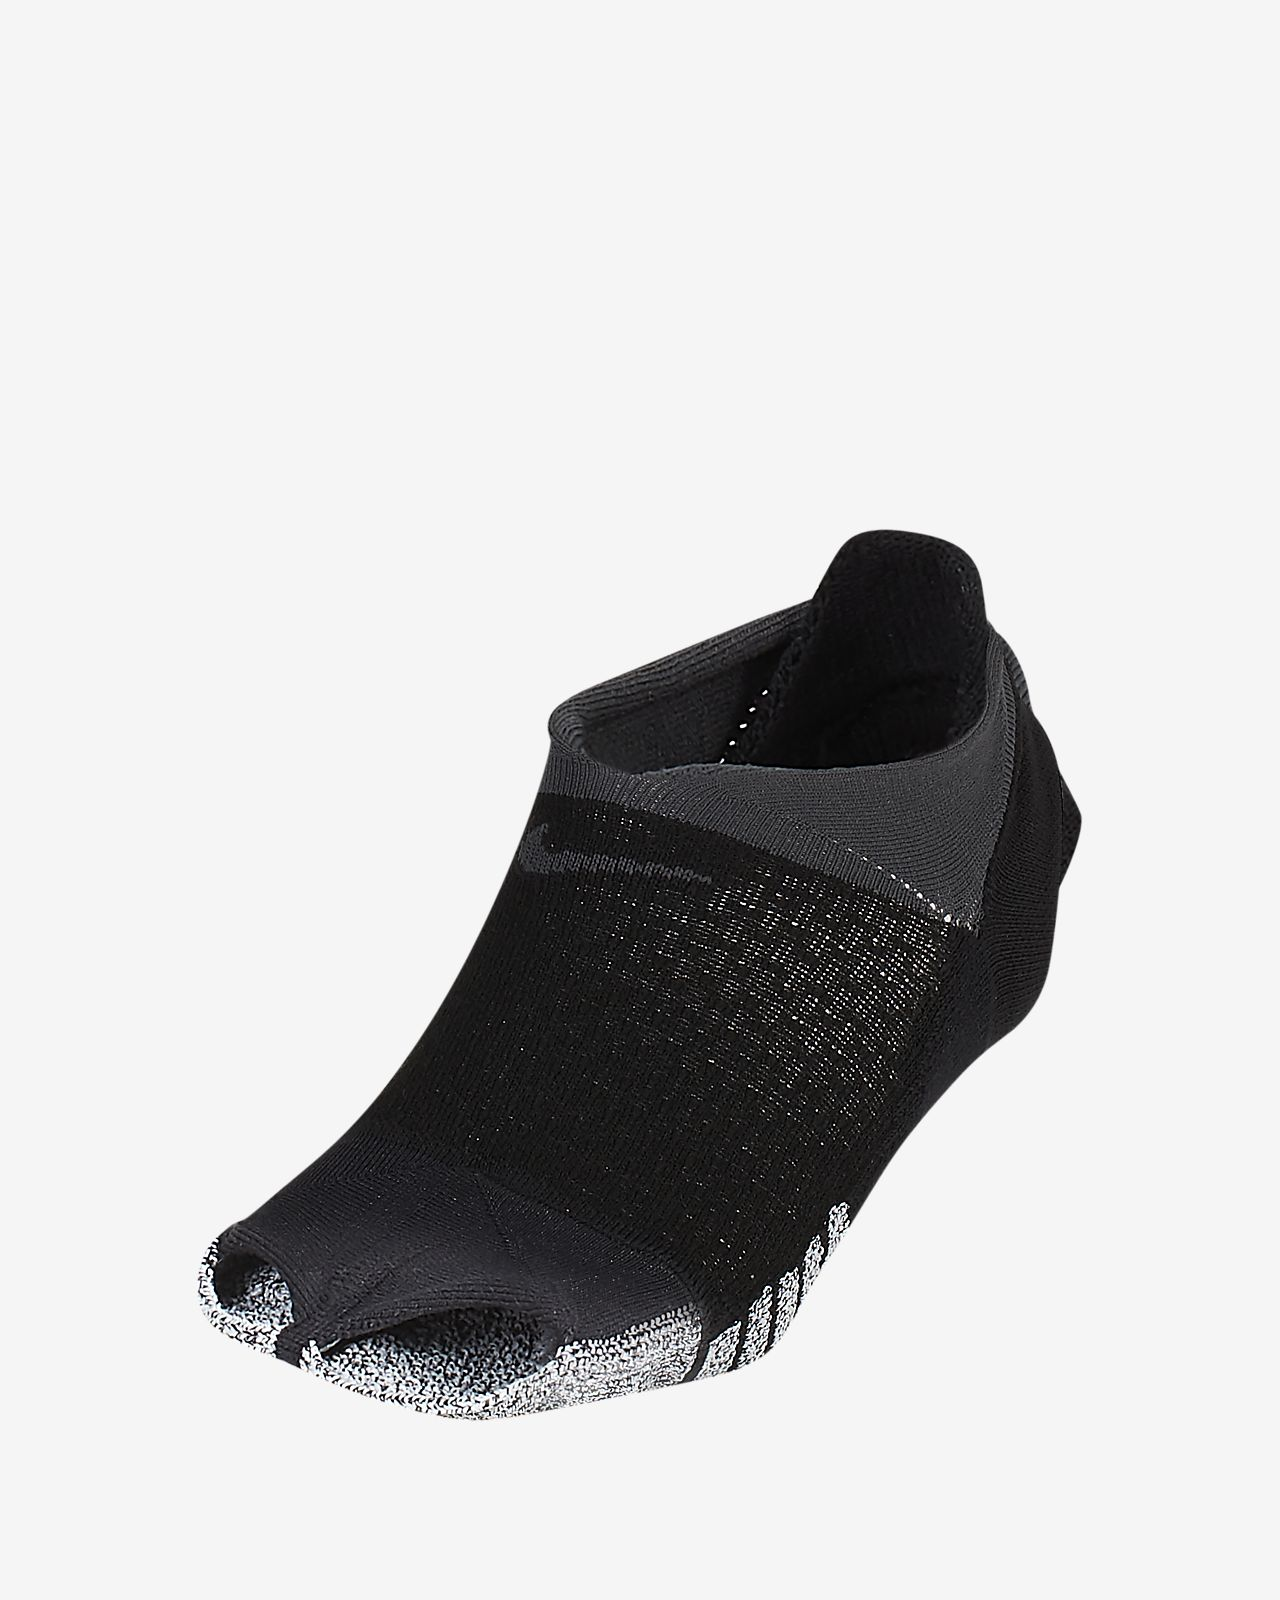 NikeGrip Studio Calcetines sin puntera - Mujer